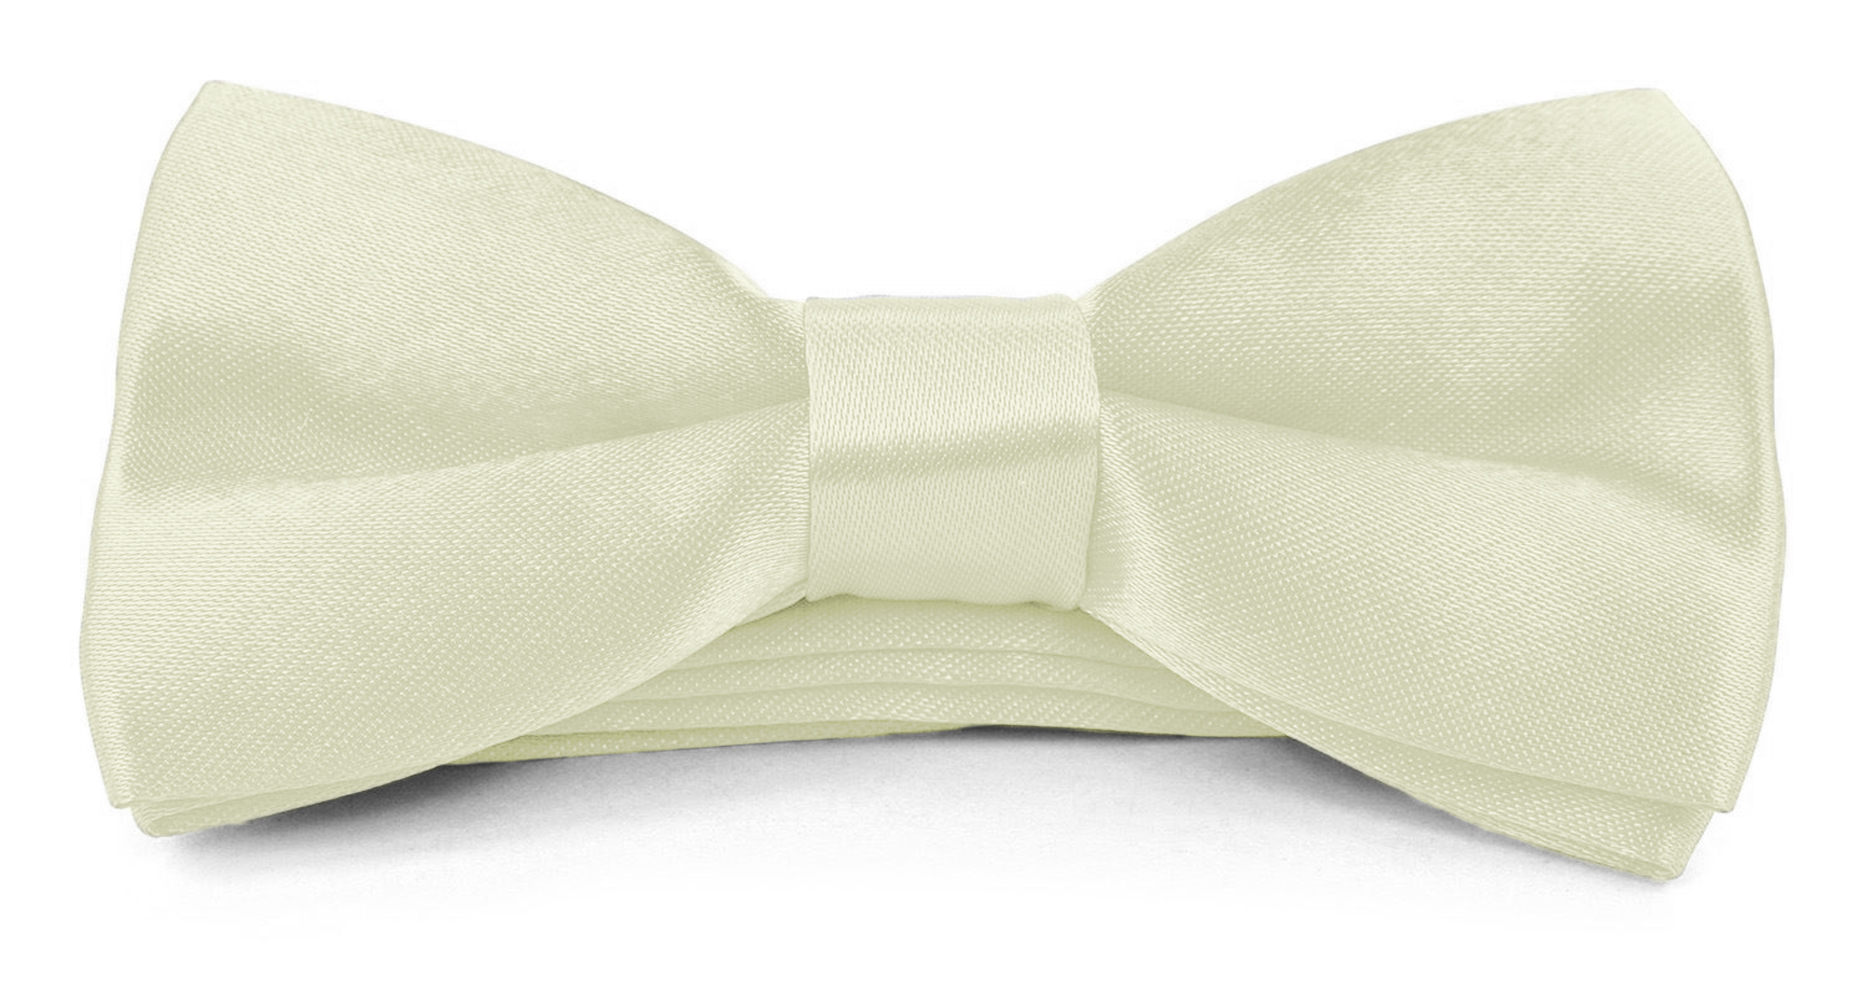 Boys Kids Childs Bow ties - Adjustable Pre Tied 4x2 Satin Silk Bowties Moda Di Raza - Off White